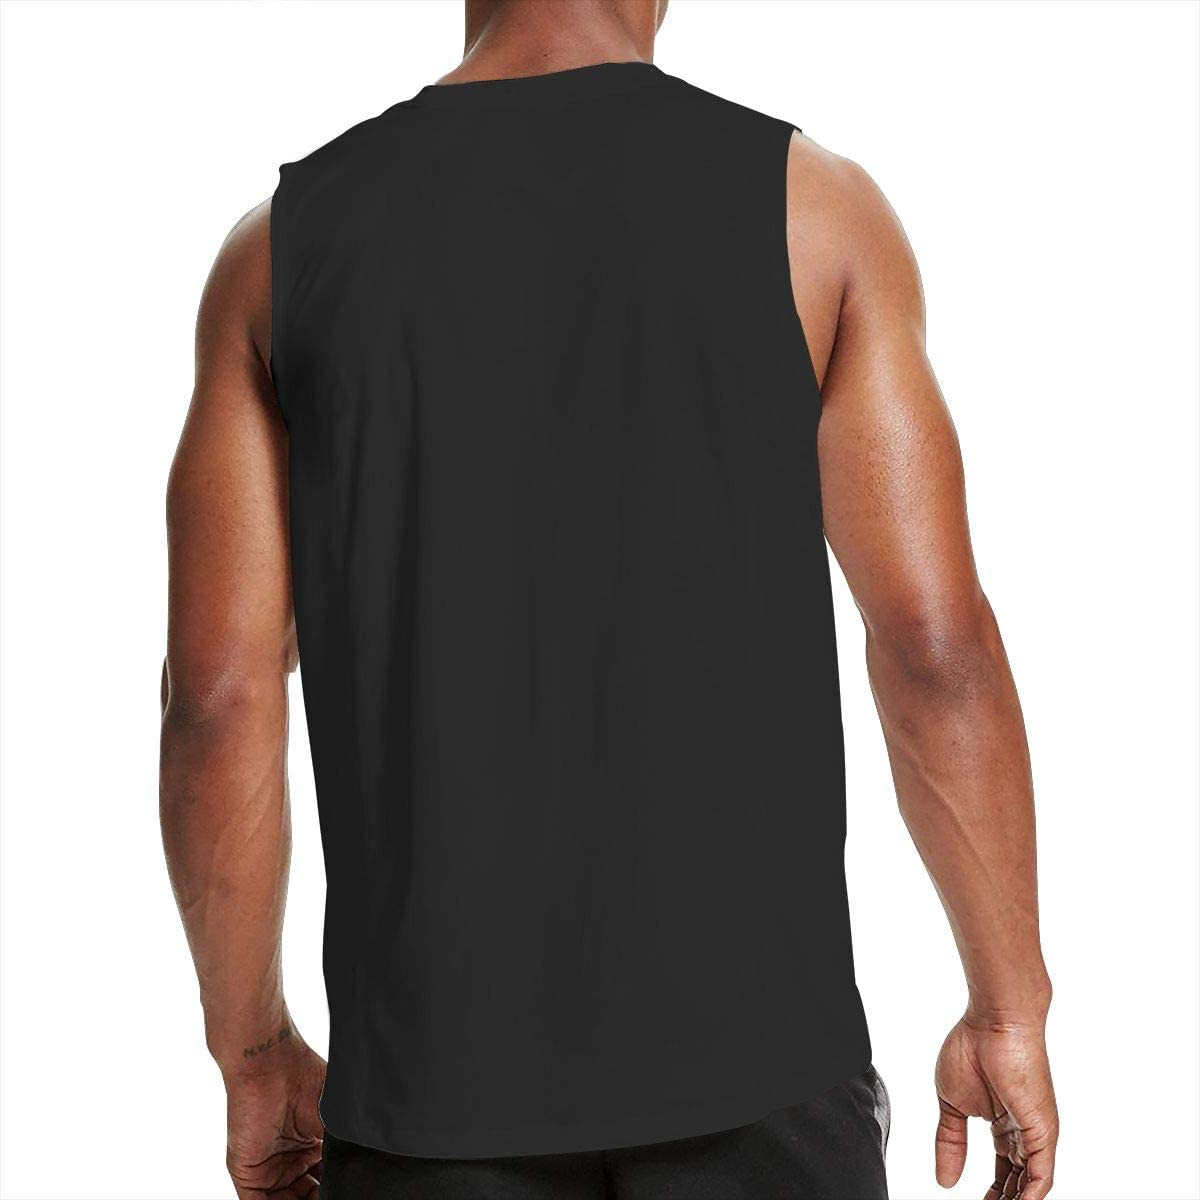 COURTNEY FORSTER Van Halen Men 3D Print Premium Tank Top Tanks Sleeveless T Shirt